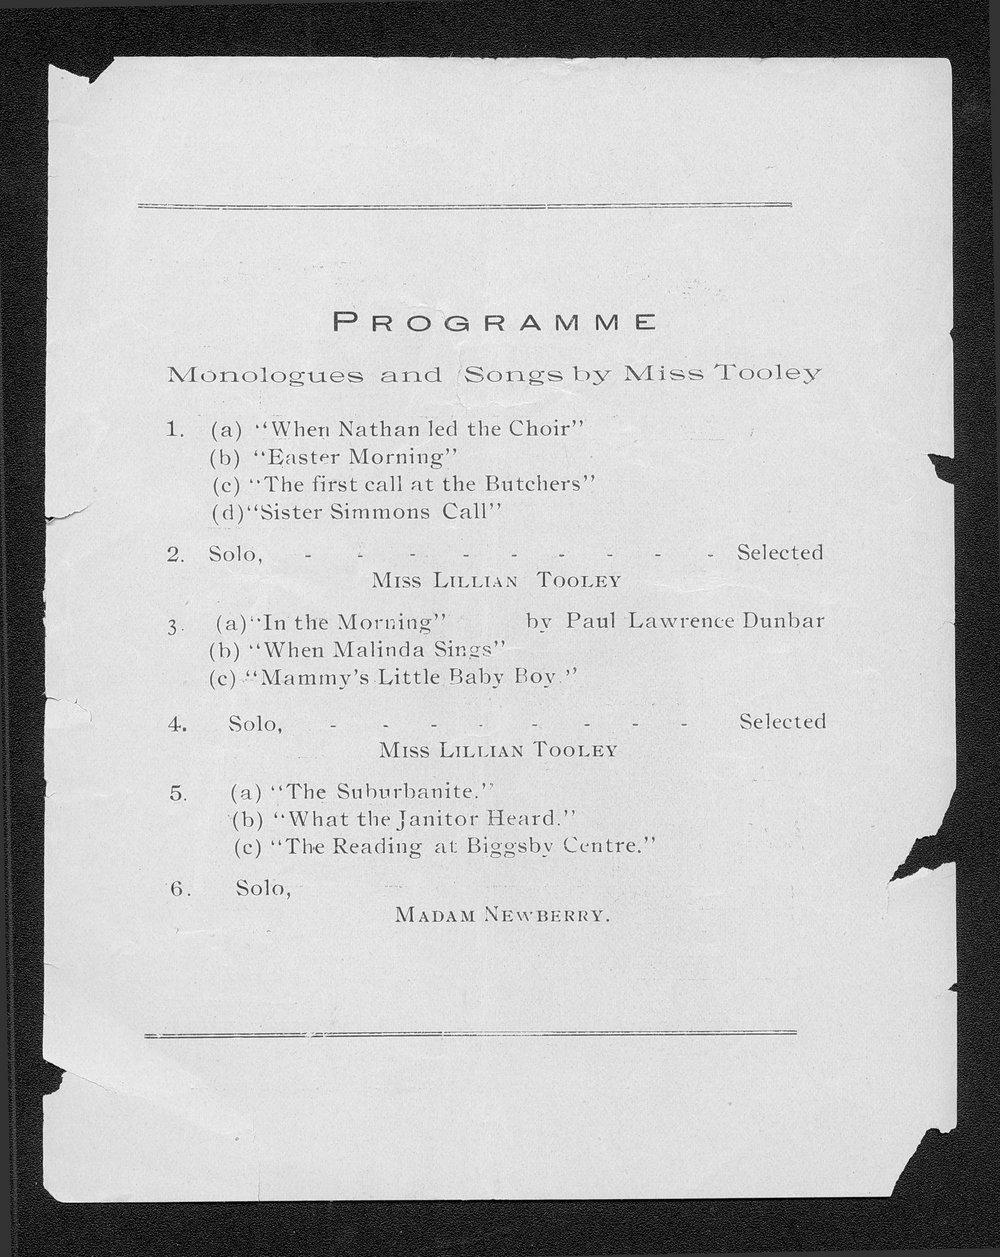 N. Clark Smith presents Miss Lillian Tooley - 4